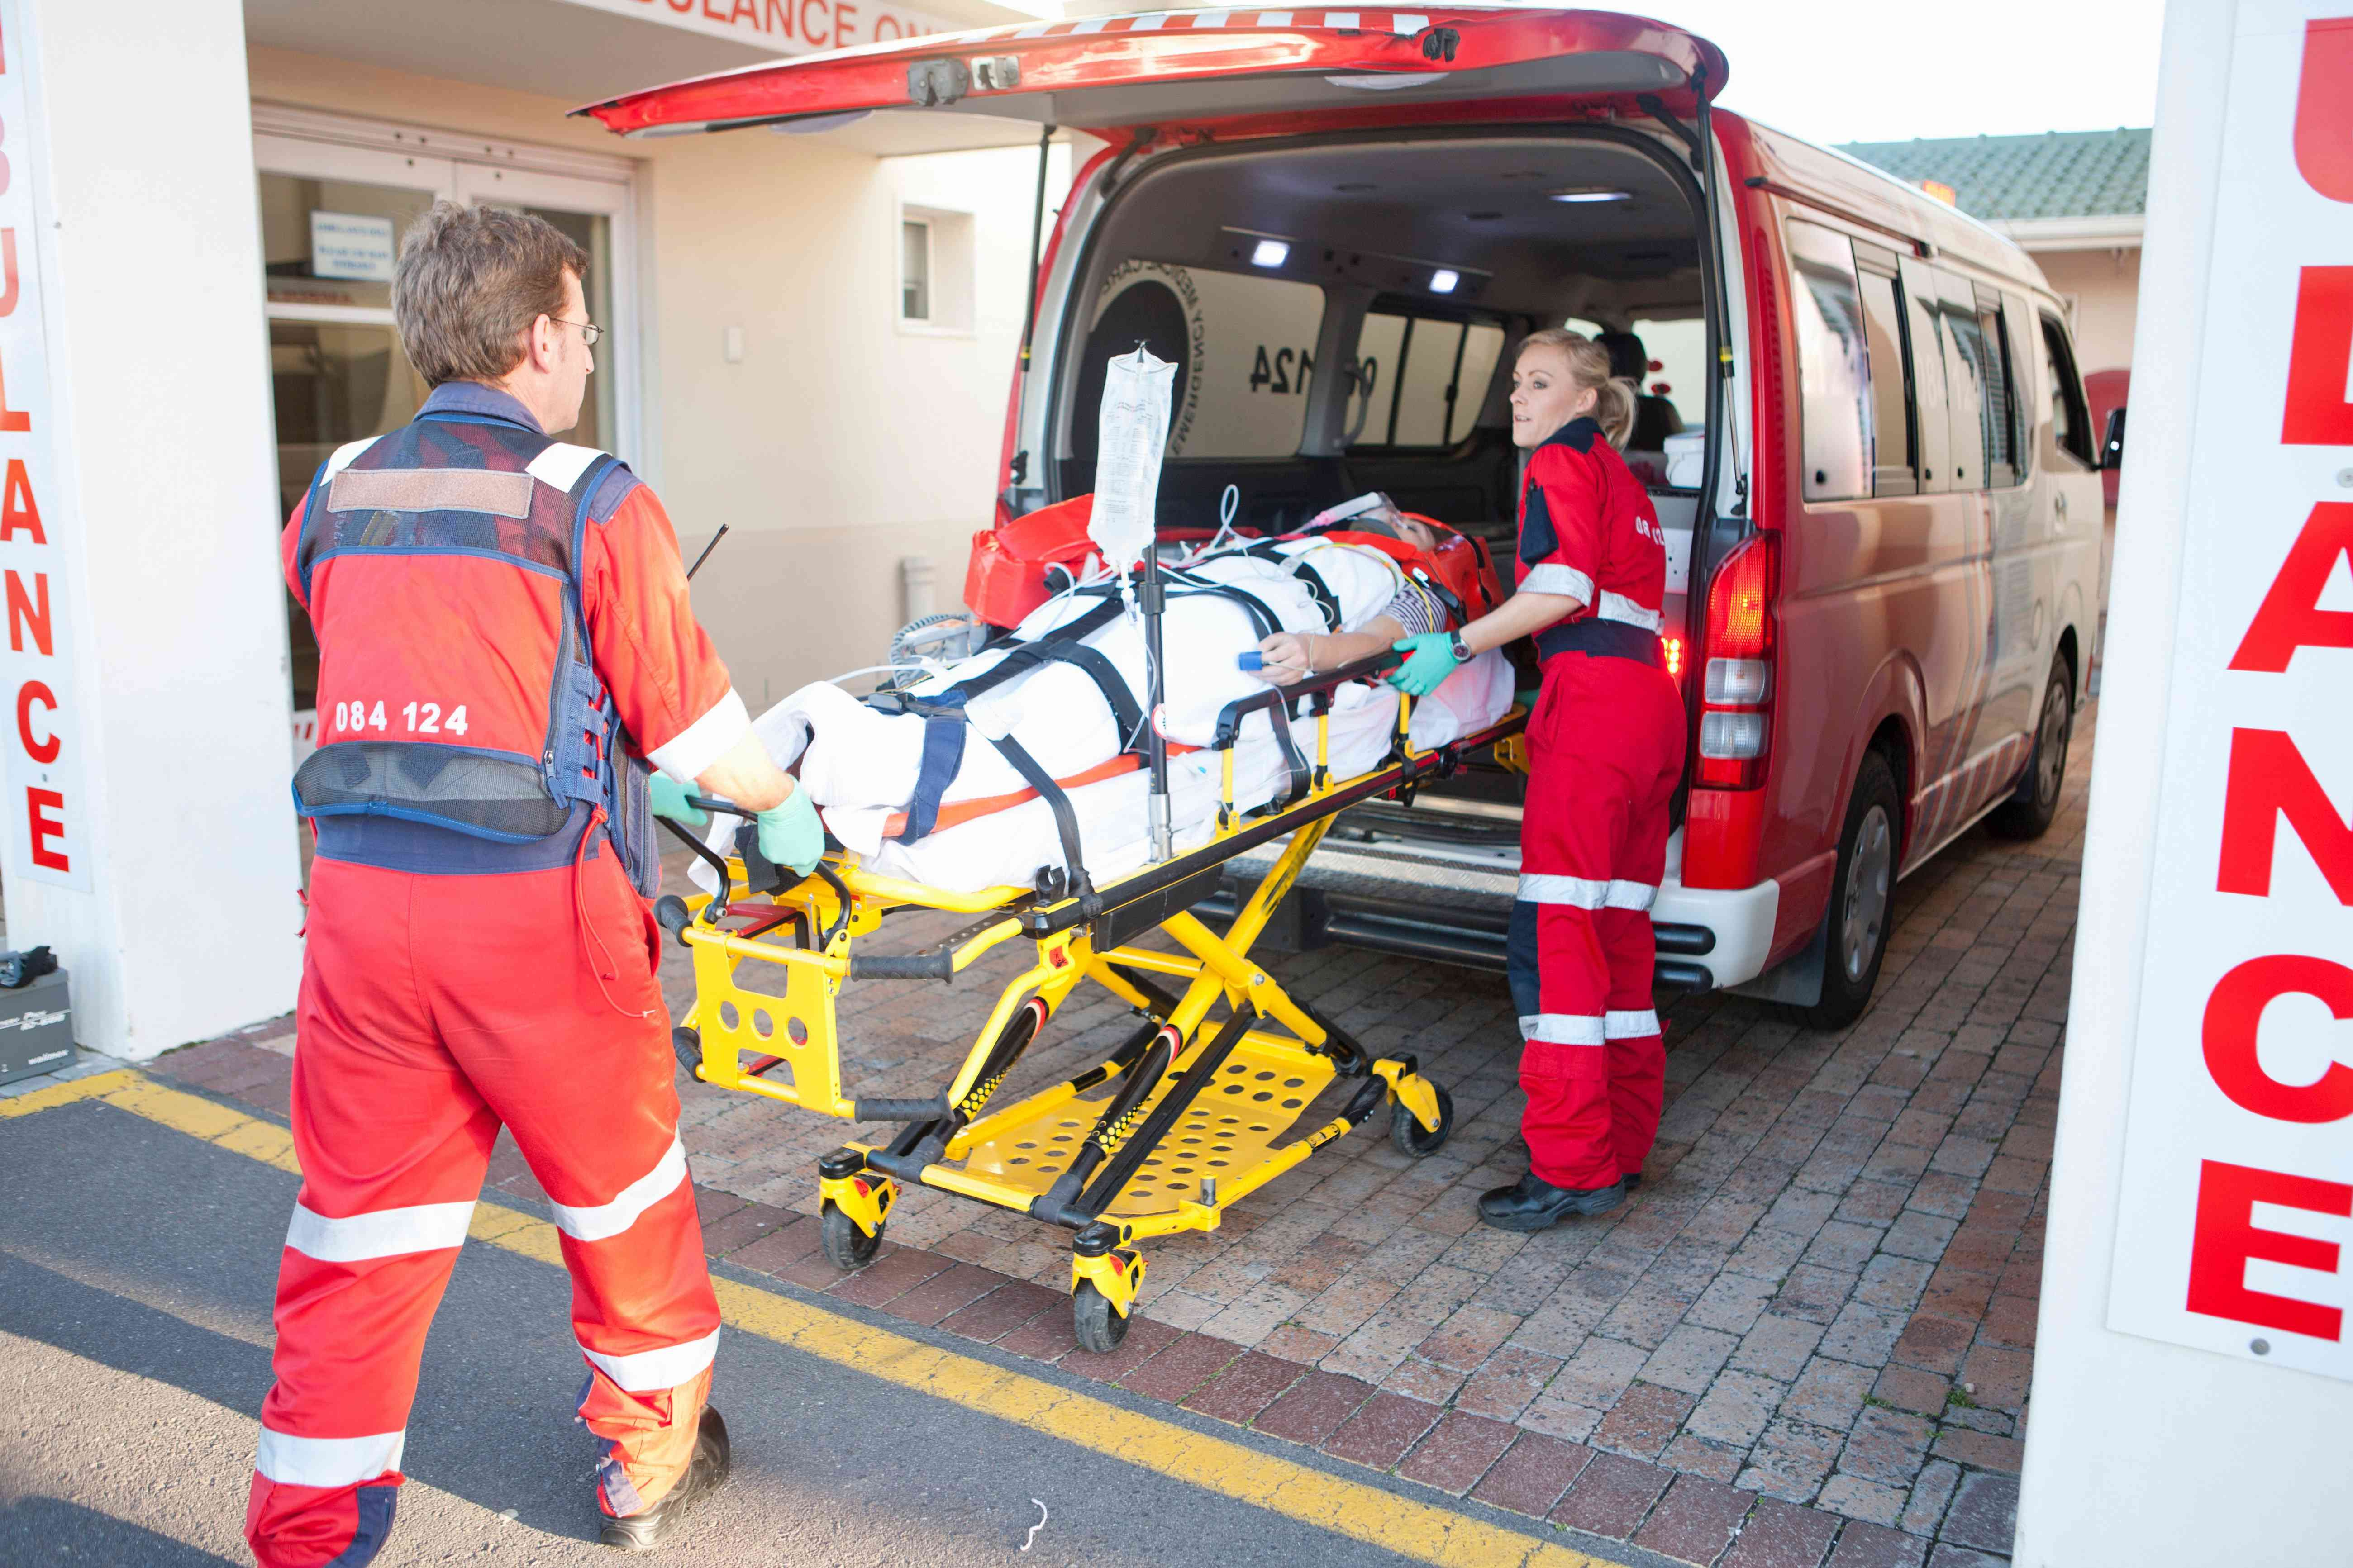 Paramedics lifting a patient from an ambulance